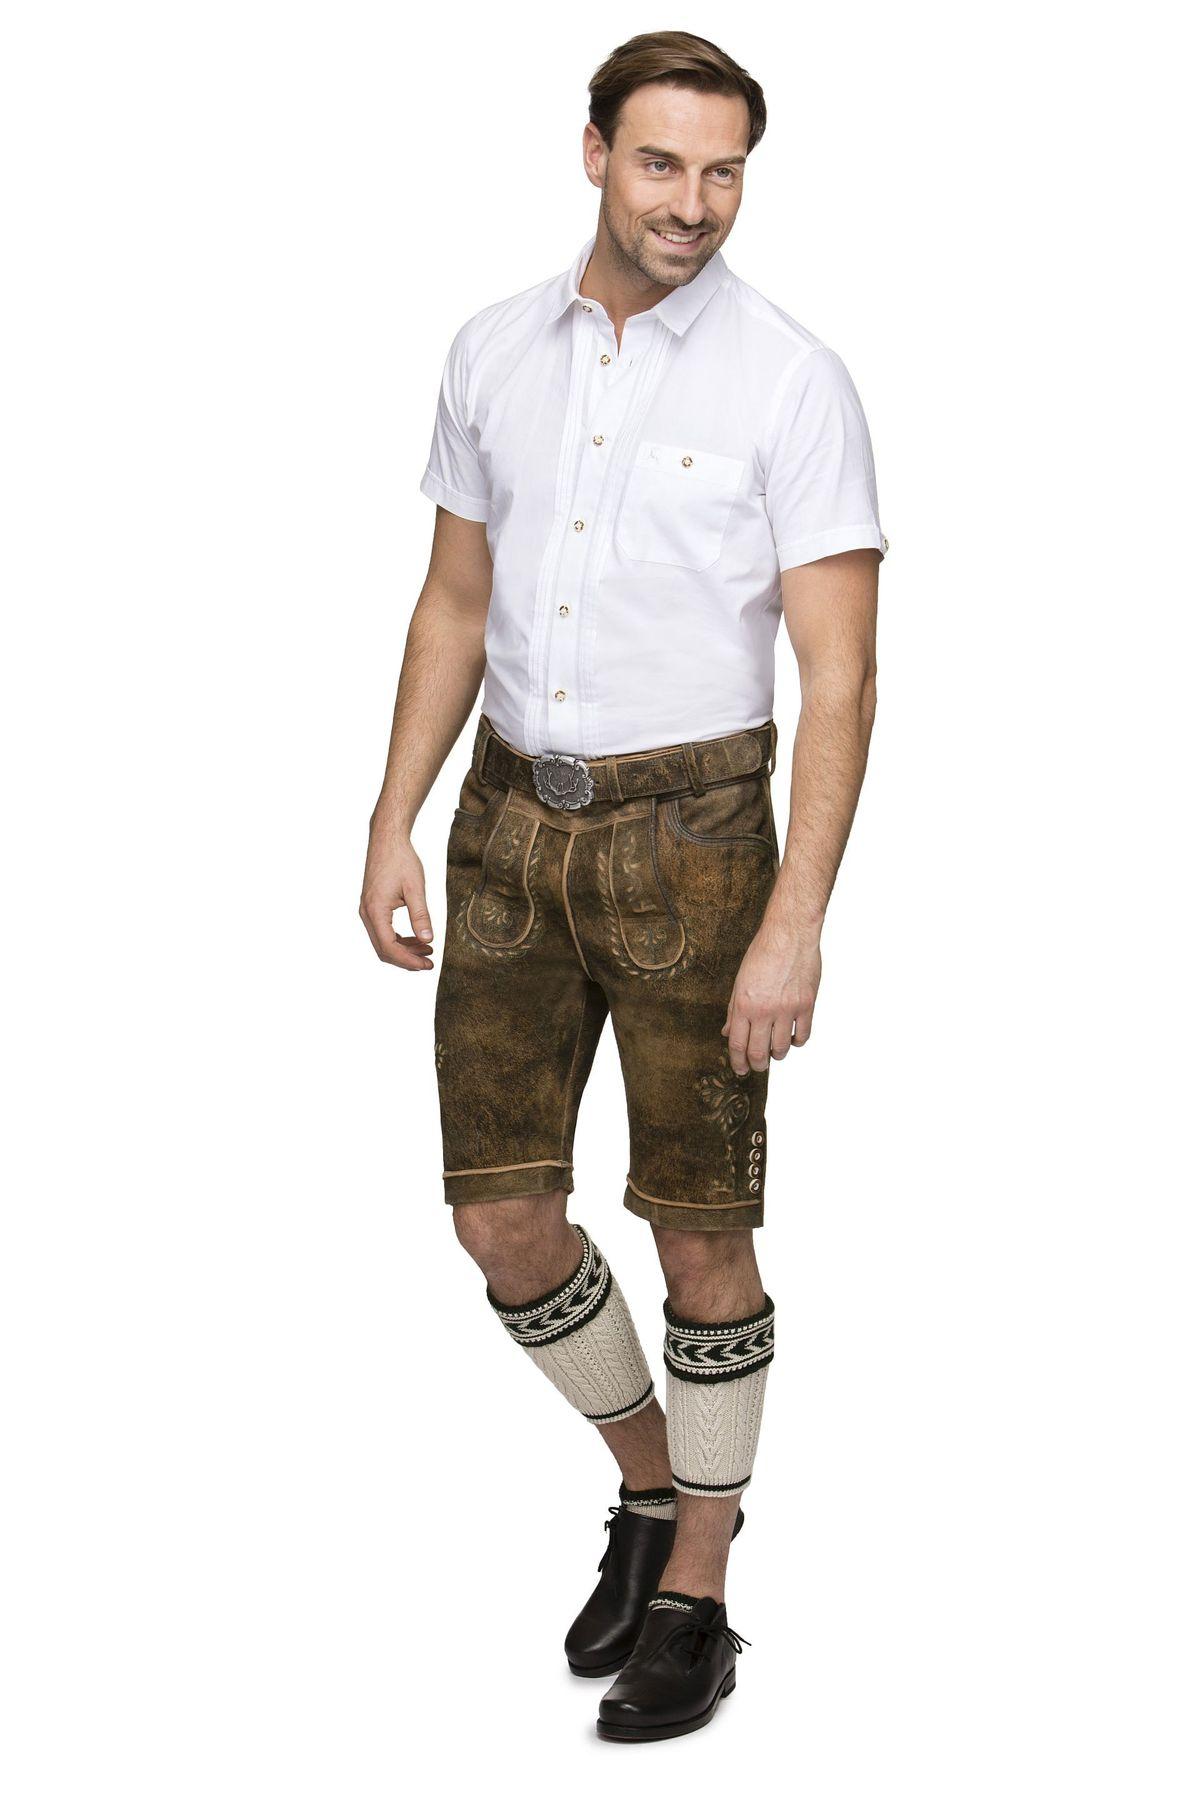 Stockerpoint - Herren Trachten Lederhose mit Gürtel in Braun antik, Sepp – Bild 3